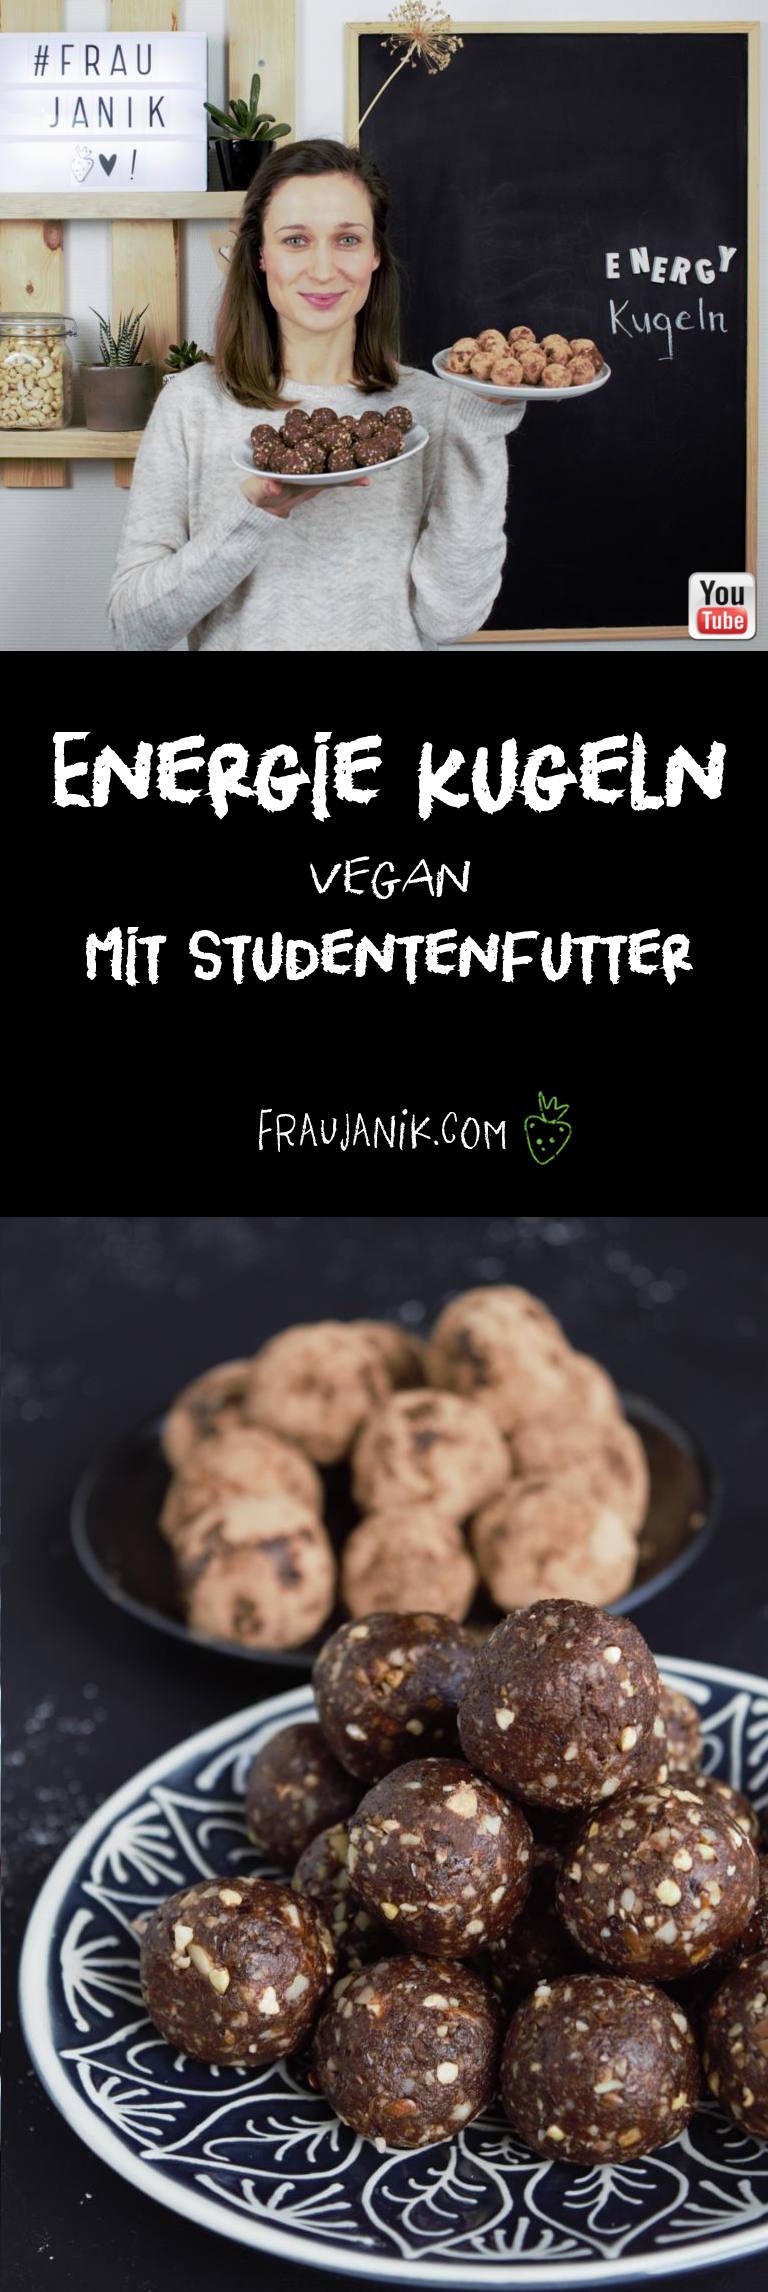 Energy Kugeln, blissballs, energiekugeln